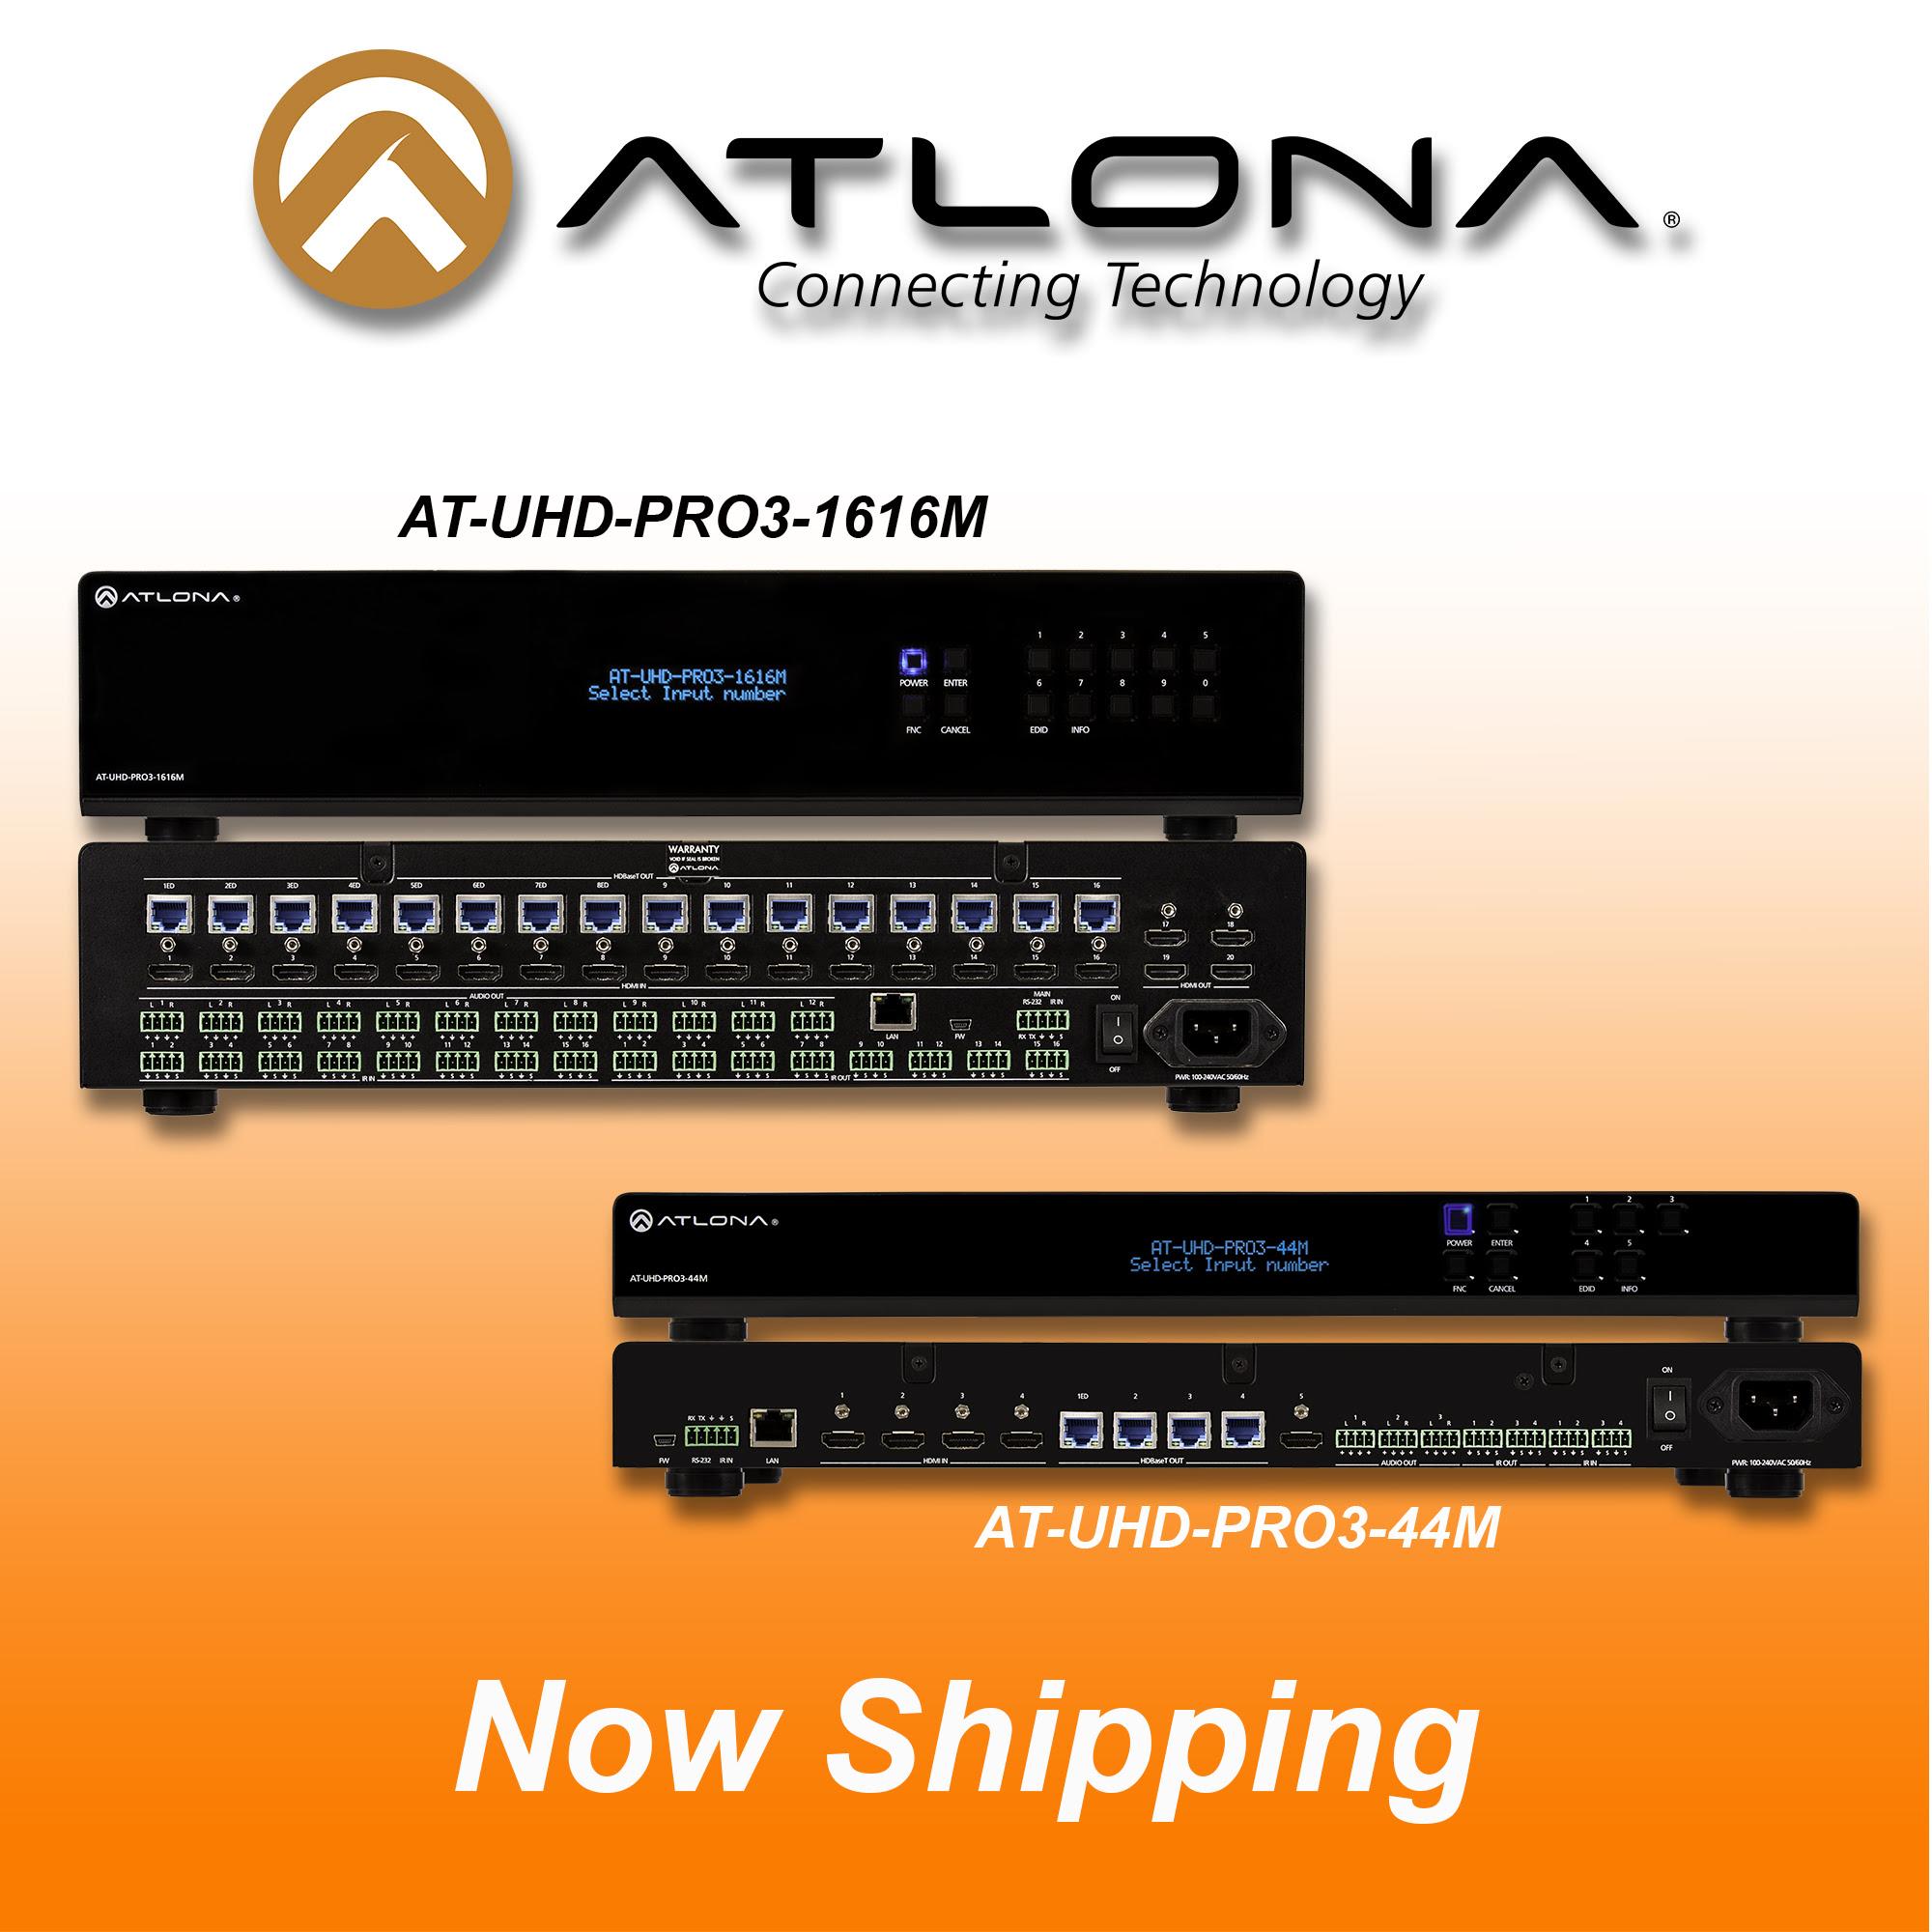 Atlona announced 4K/UHD Series of Matrix Switchers